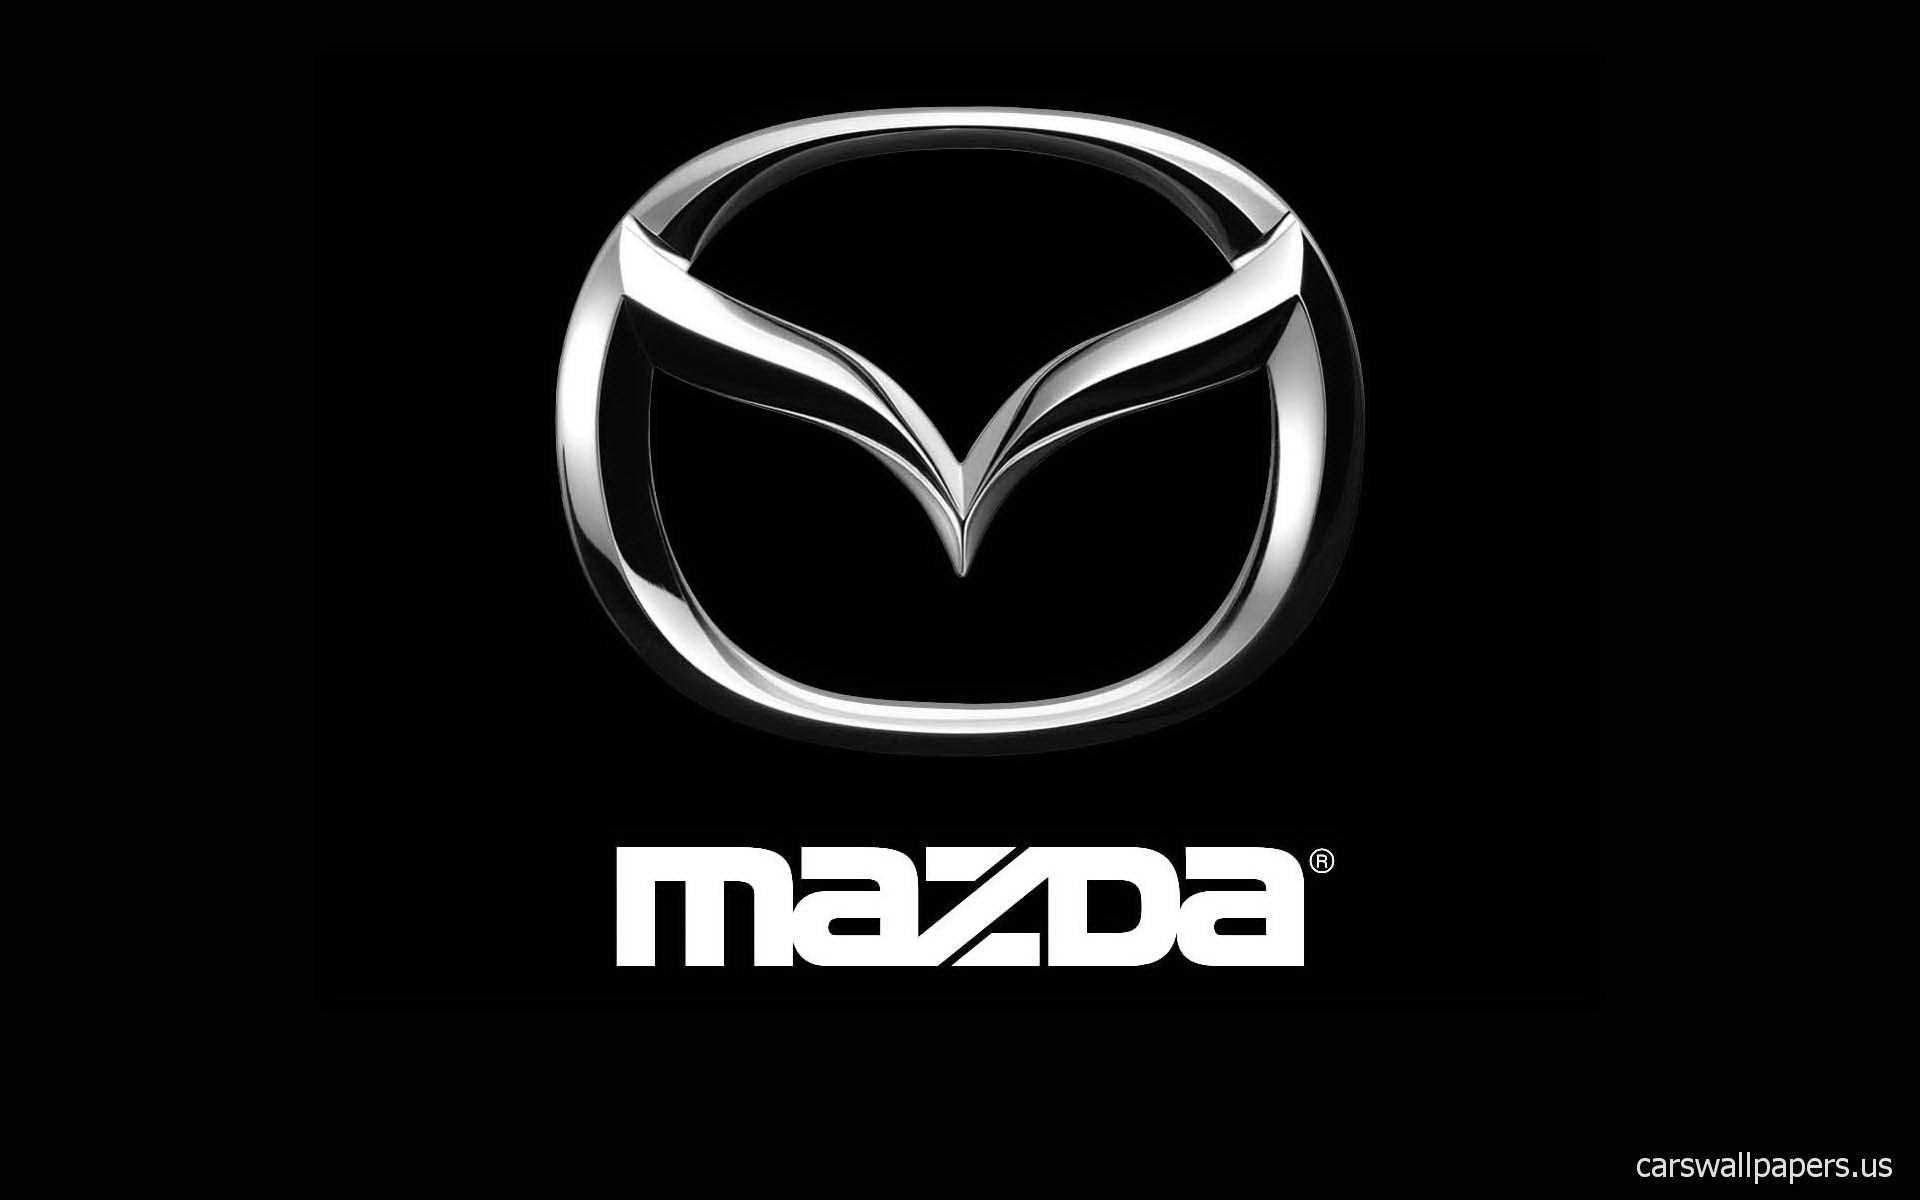 fond-ecran-transport-autos-mazda-logo-001 (1)